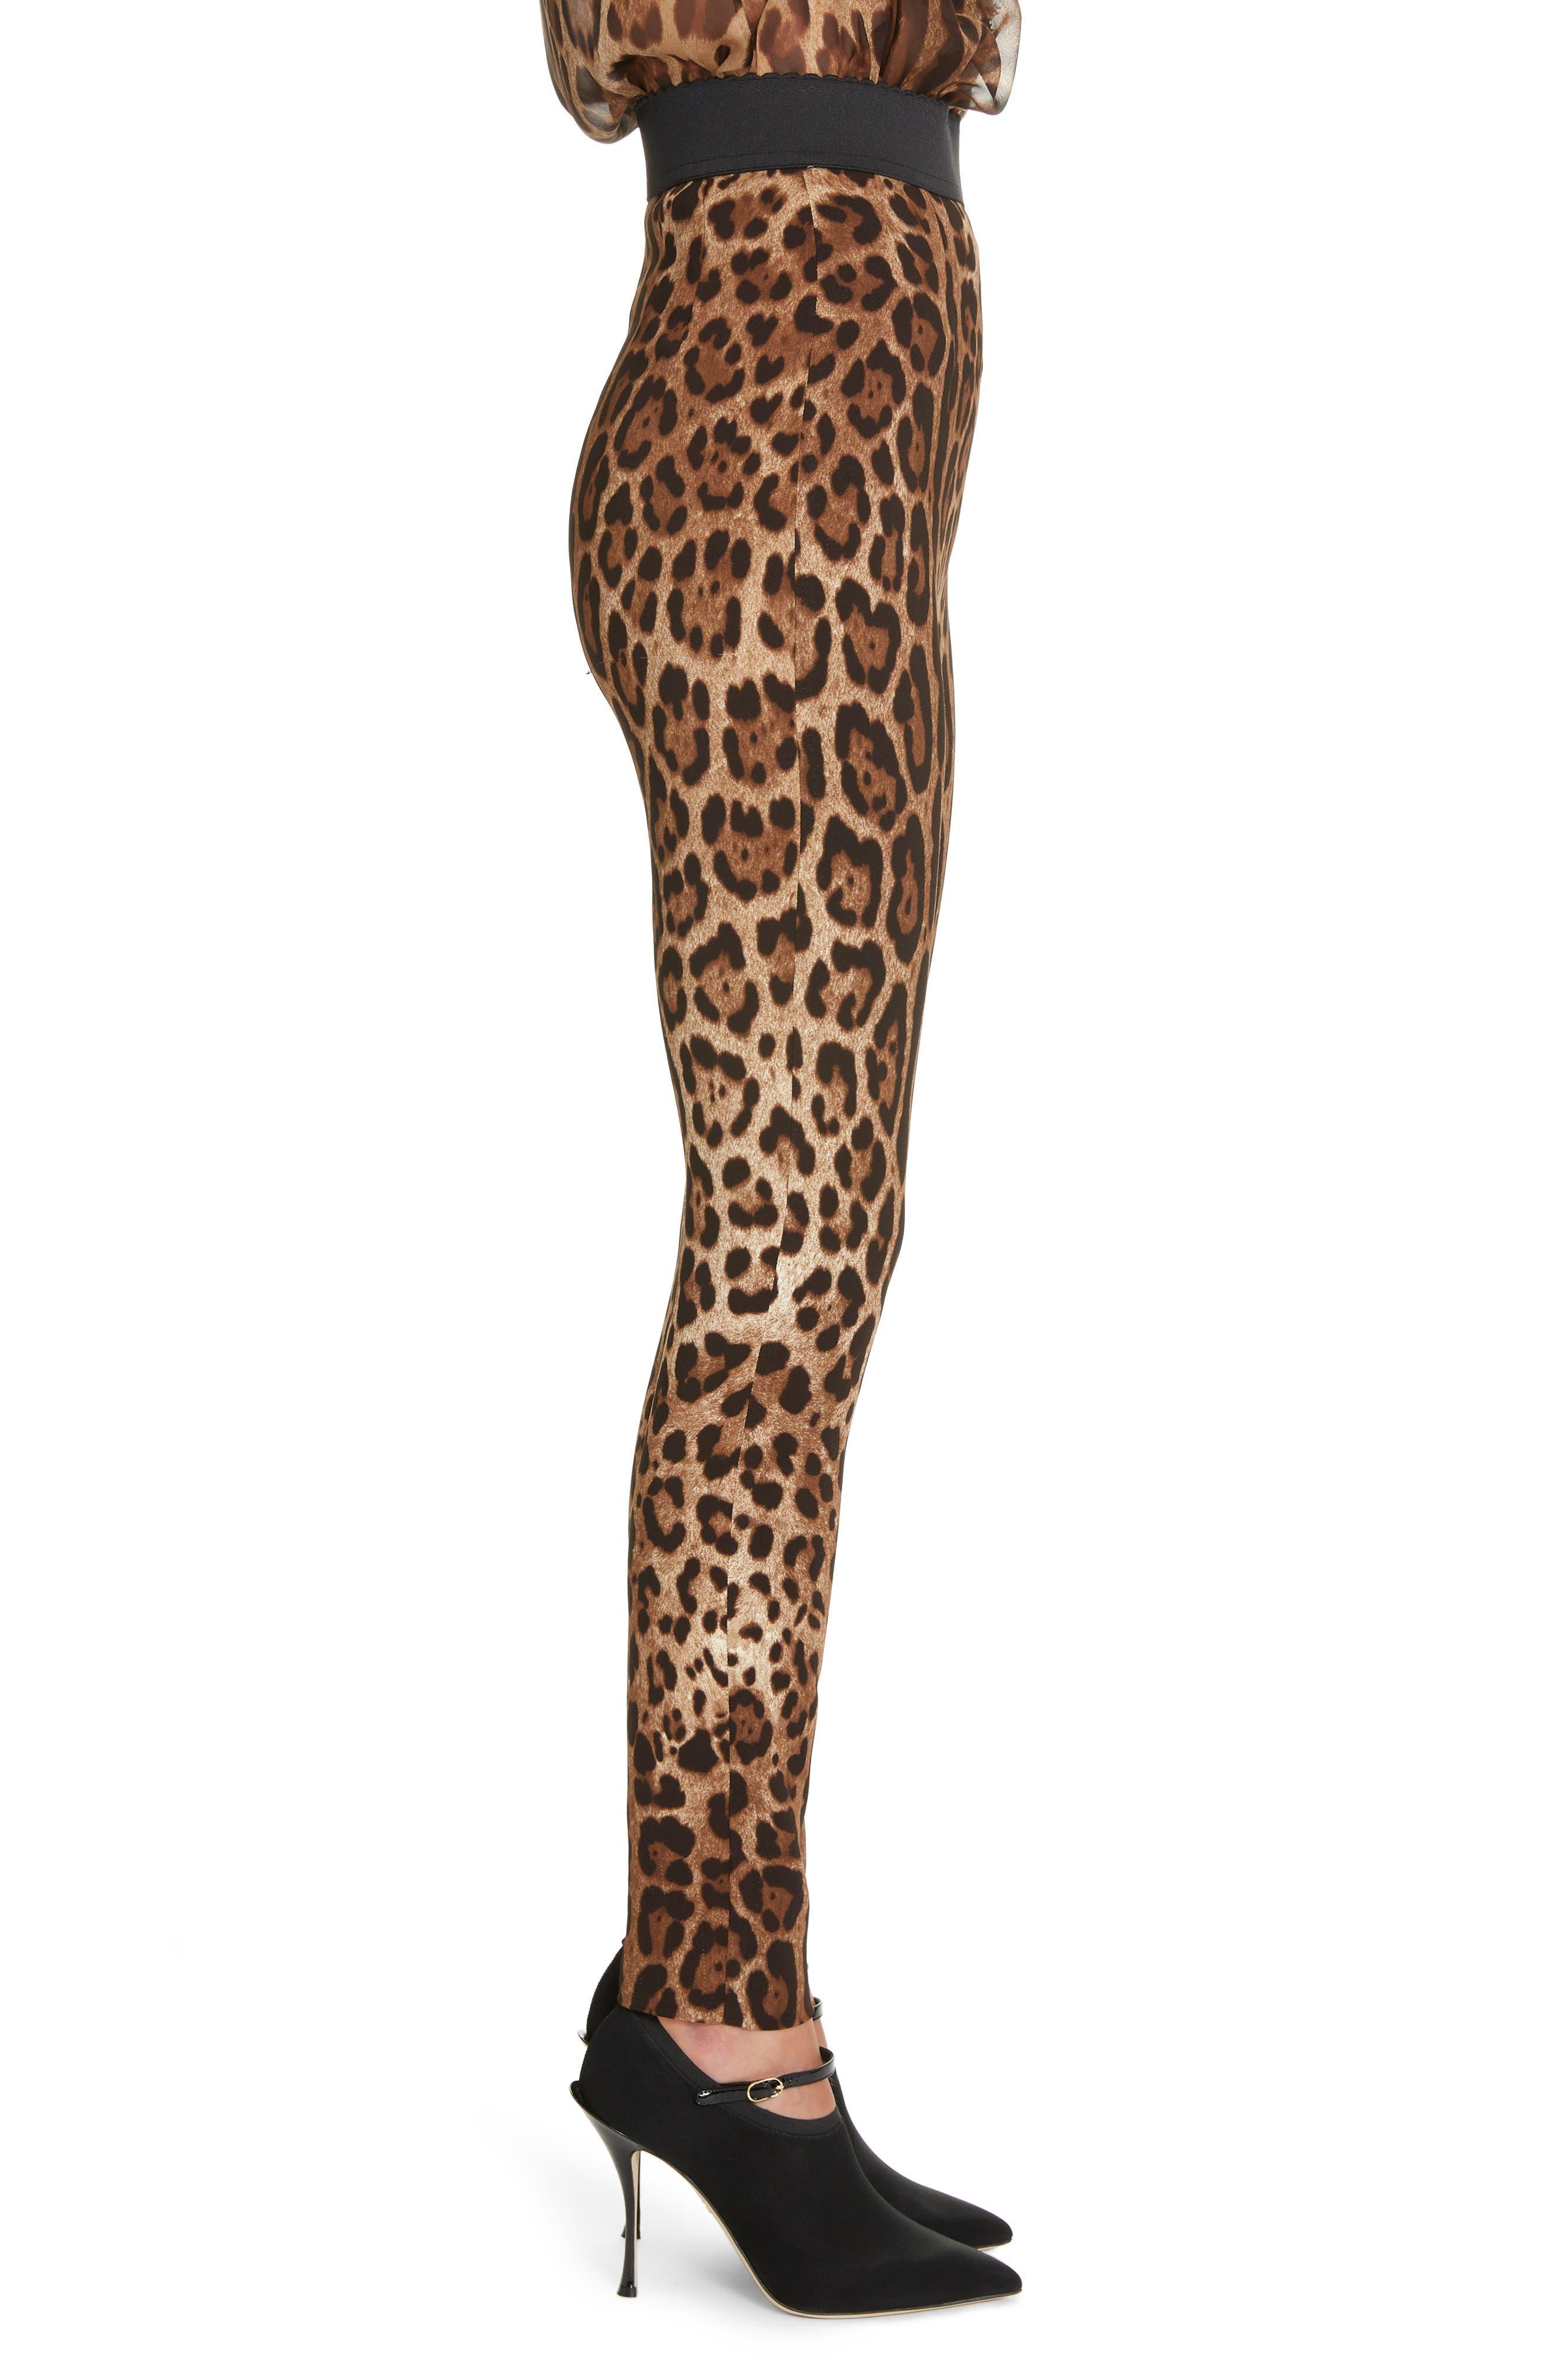 DOLCE&GABBANA, Leopard Print Cady Leggings, Alternate thumbnail 3, color, LEO